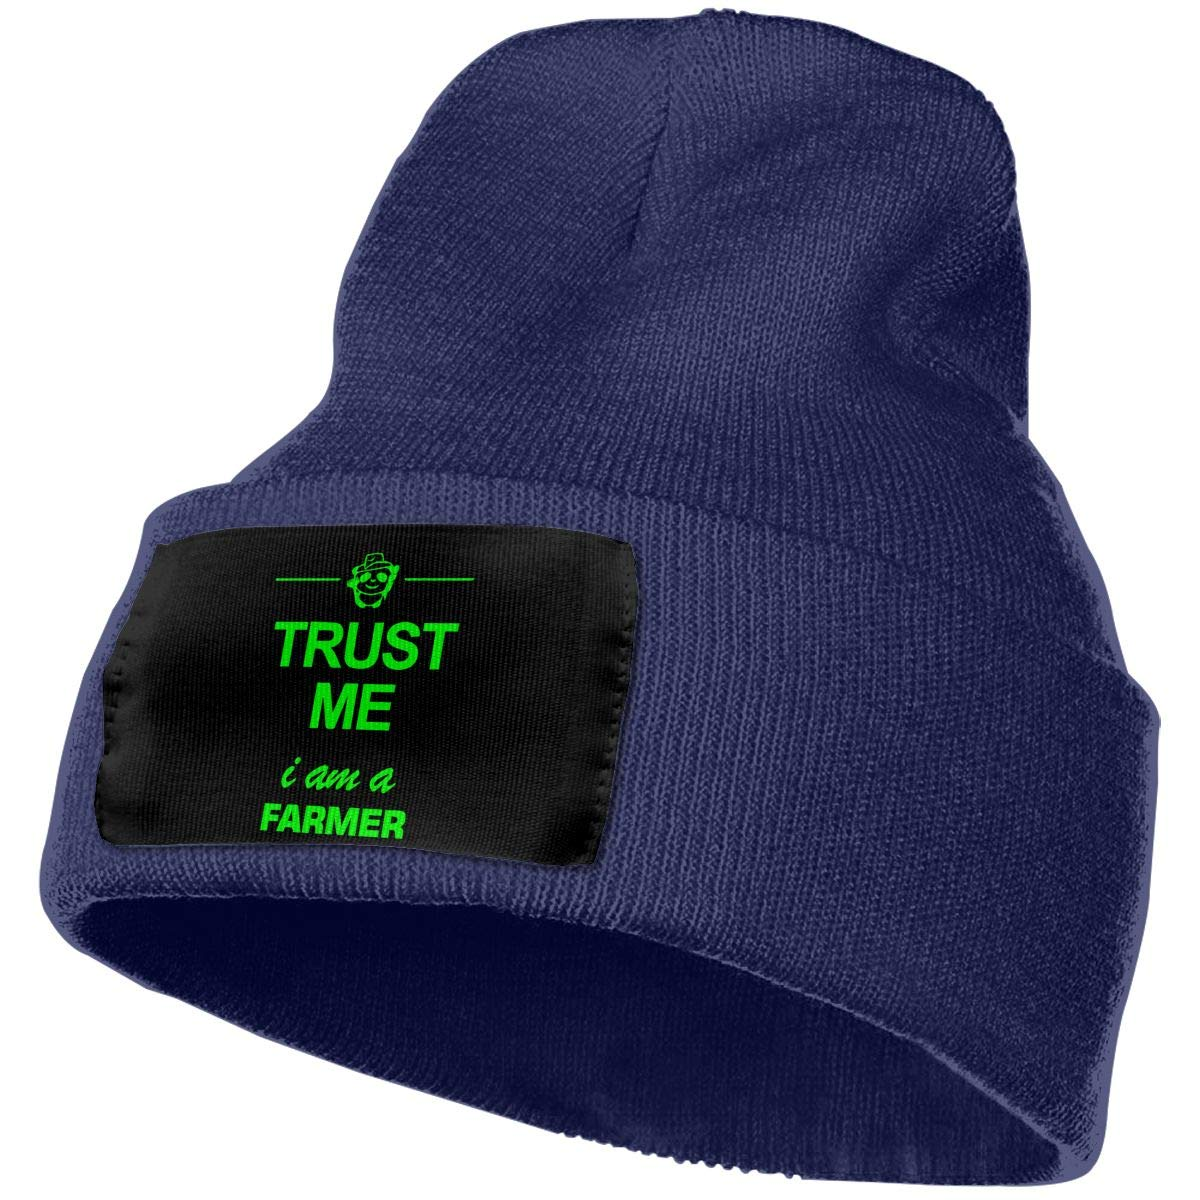 Trust Me I Am Farmer 2 Women and Men Skull Caps Winter Warm Stretchy Knit Beanie Hats